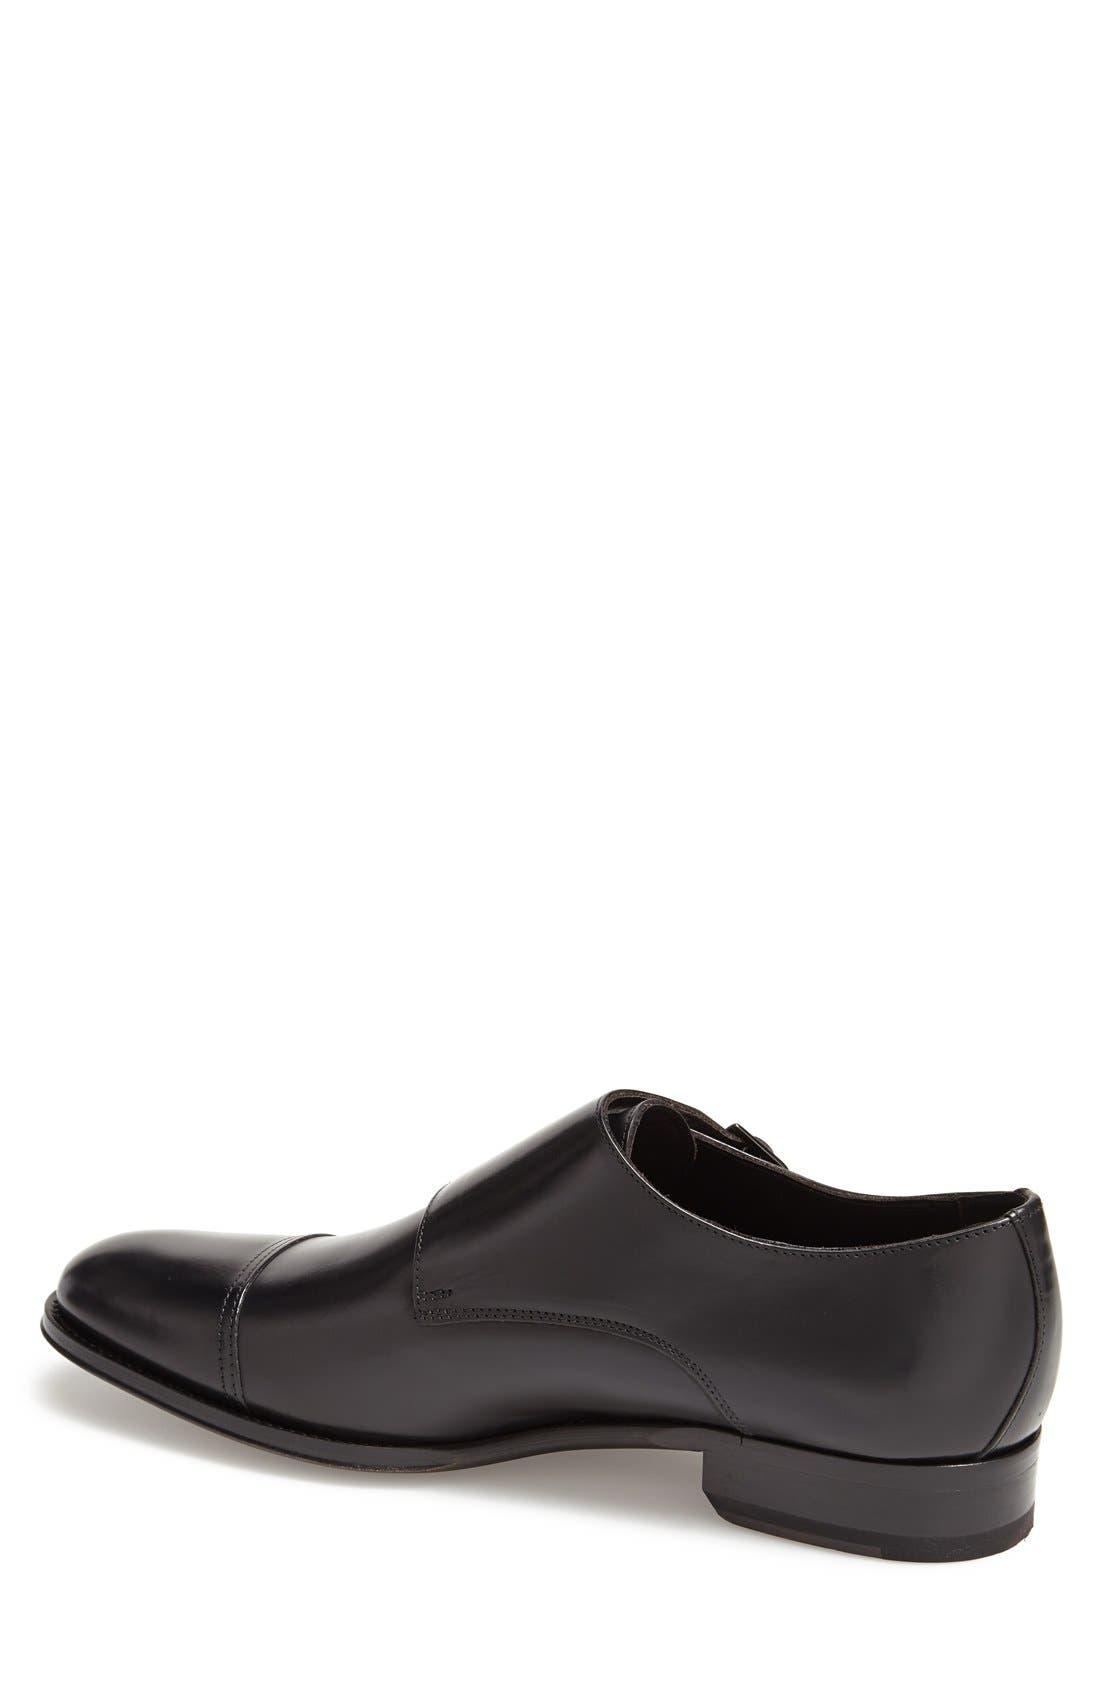 Alternate Image 2  - To Boot New York 'Medford' Double Monk Strap Shoe (Men)